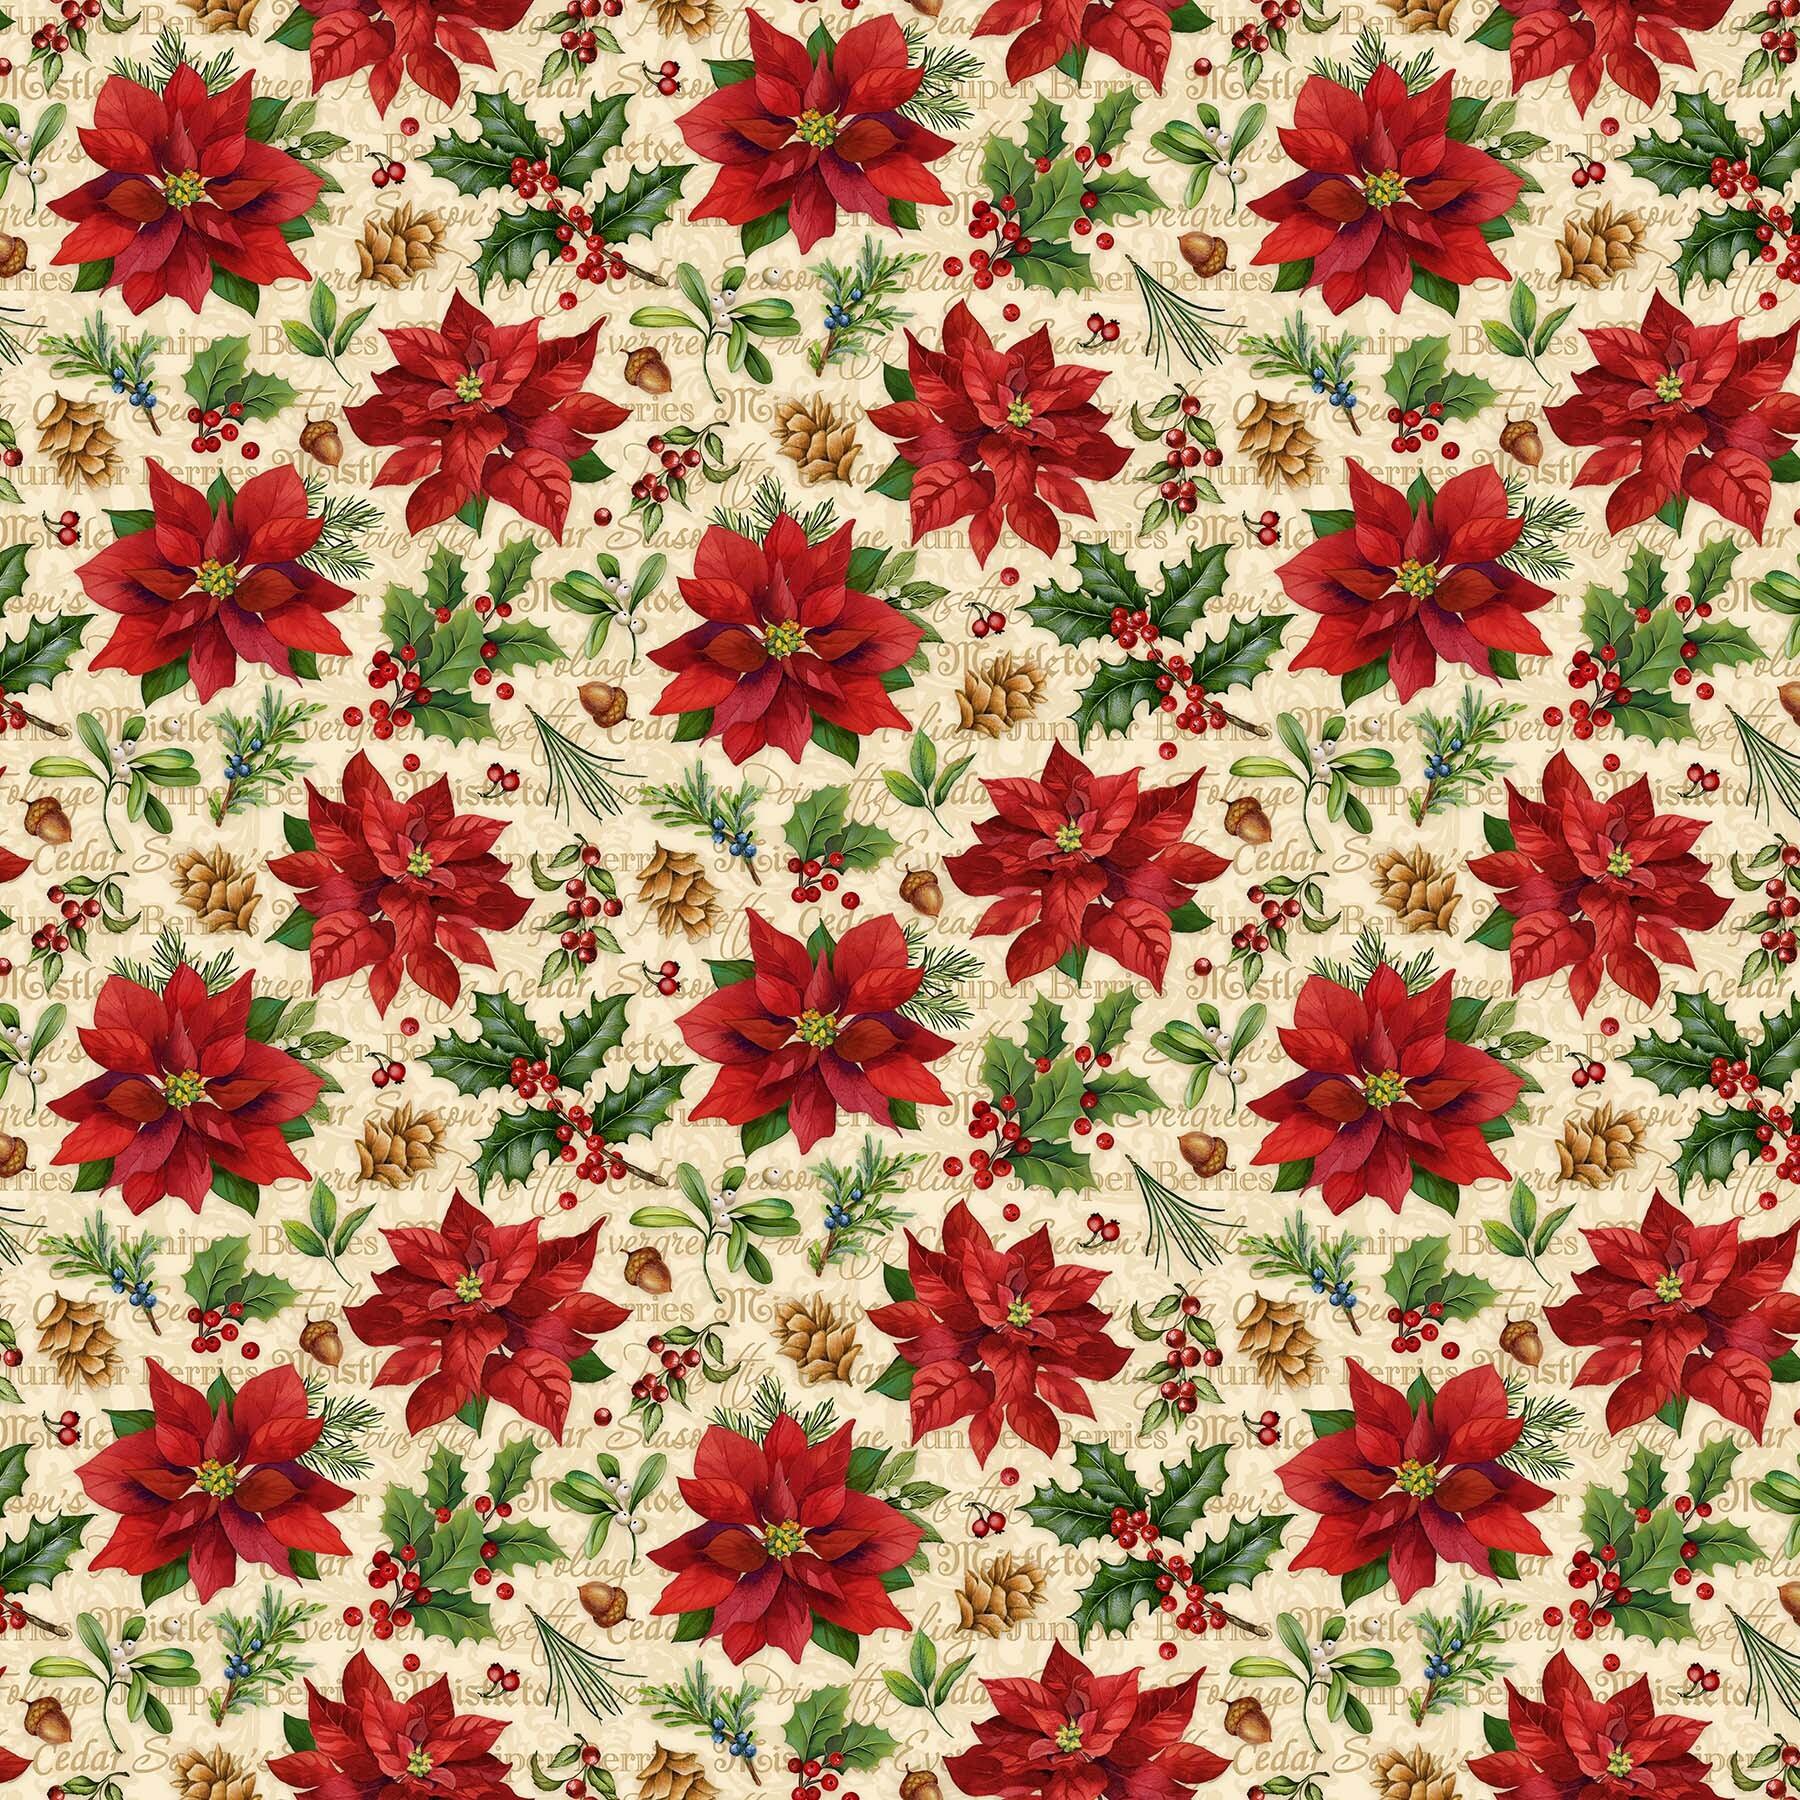 Old Time Christmas - Poinsettias on Cream - 1/2m cut 57957